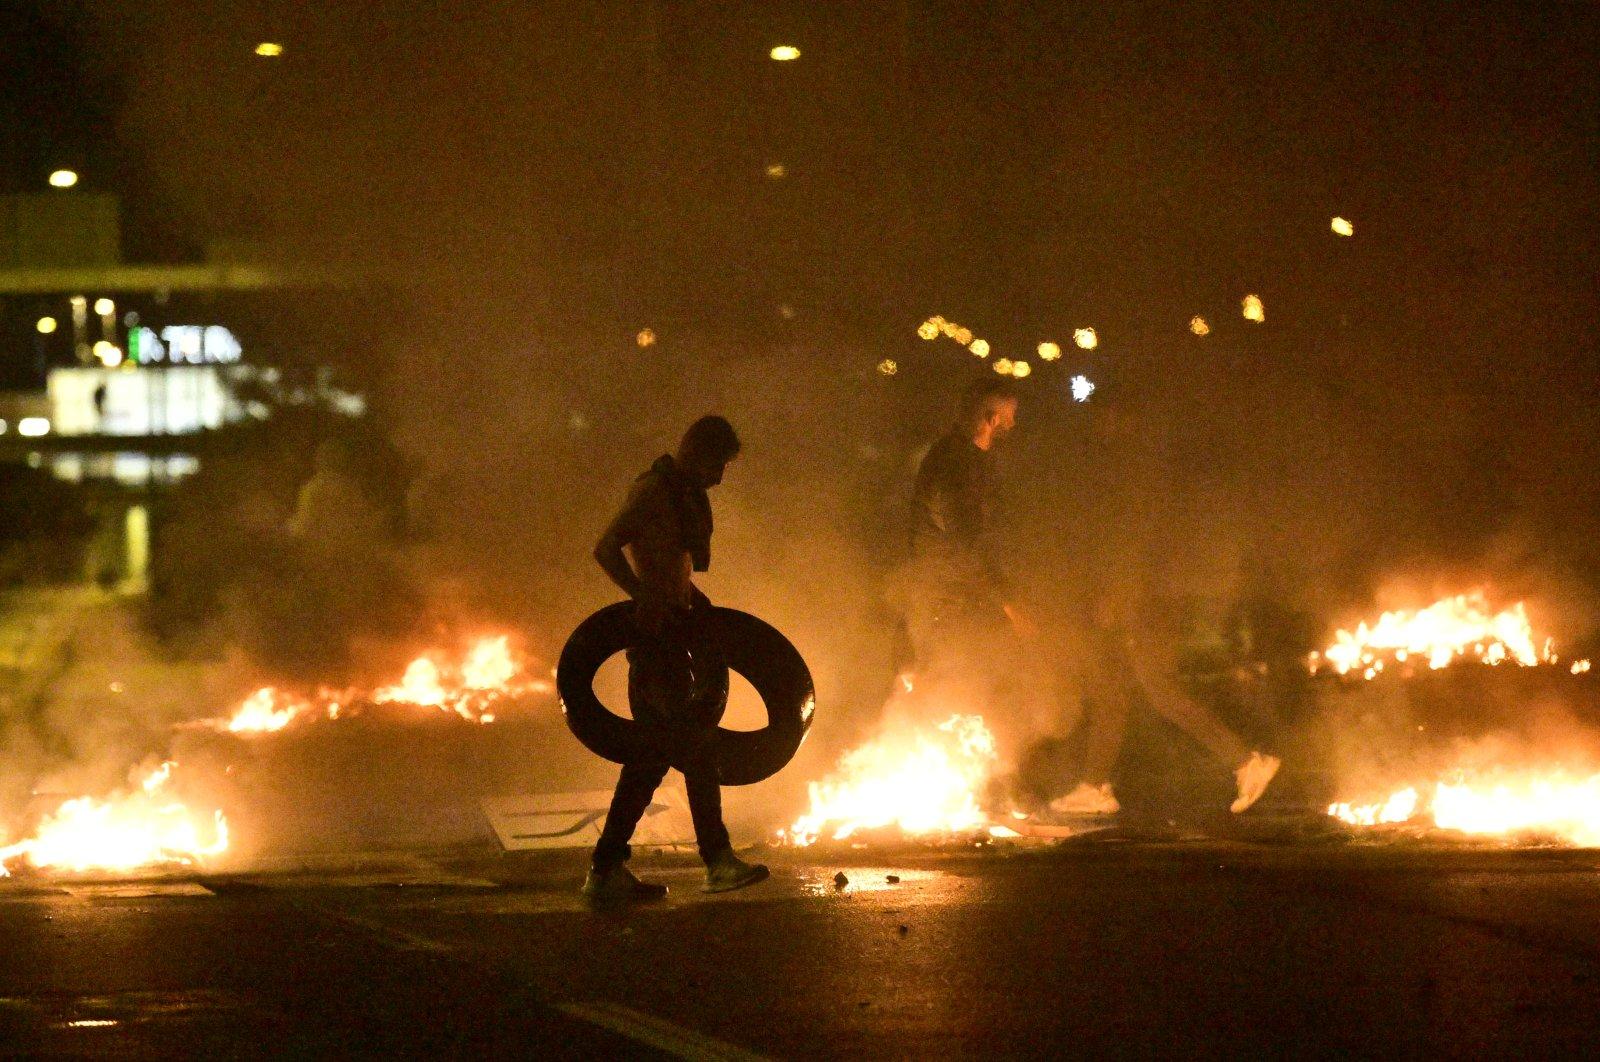 Demonstrators burn tires as protesters riot in the Rosengard neighborhood of Malmo, Sweden, Aug. 28, 2020. (EPA Photo)